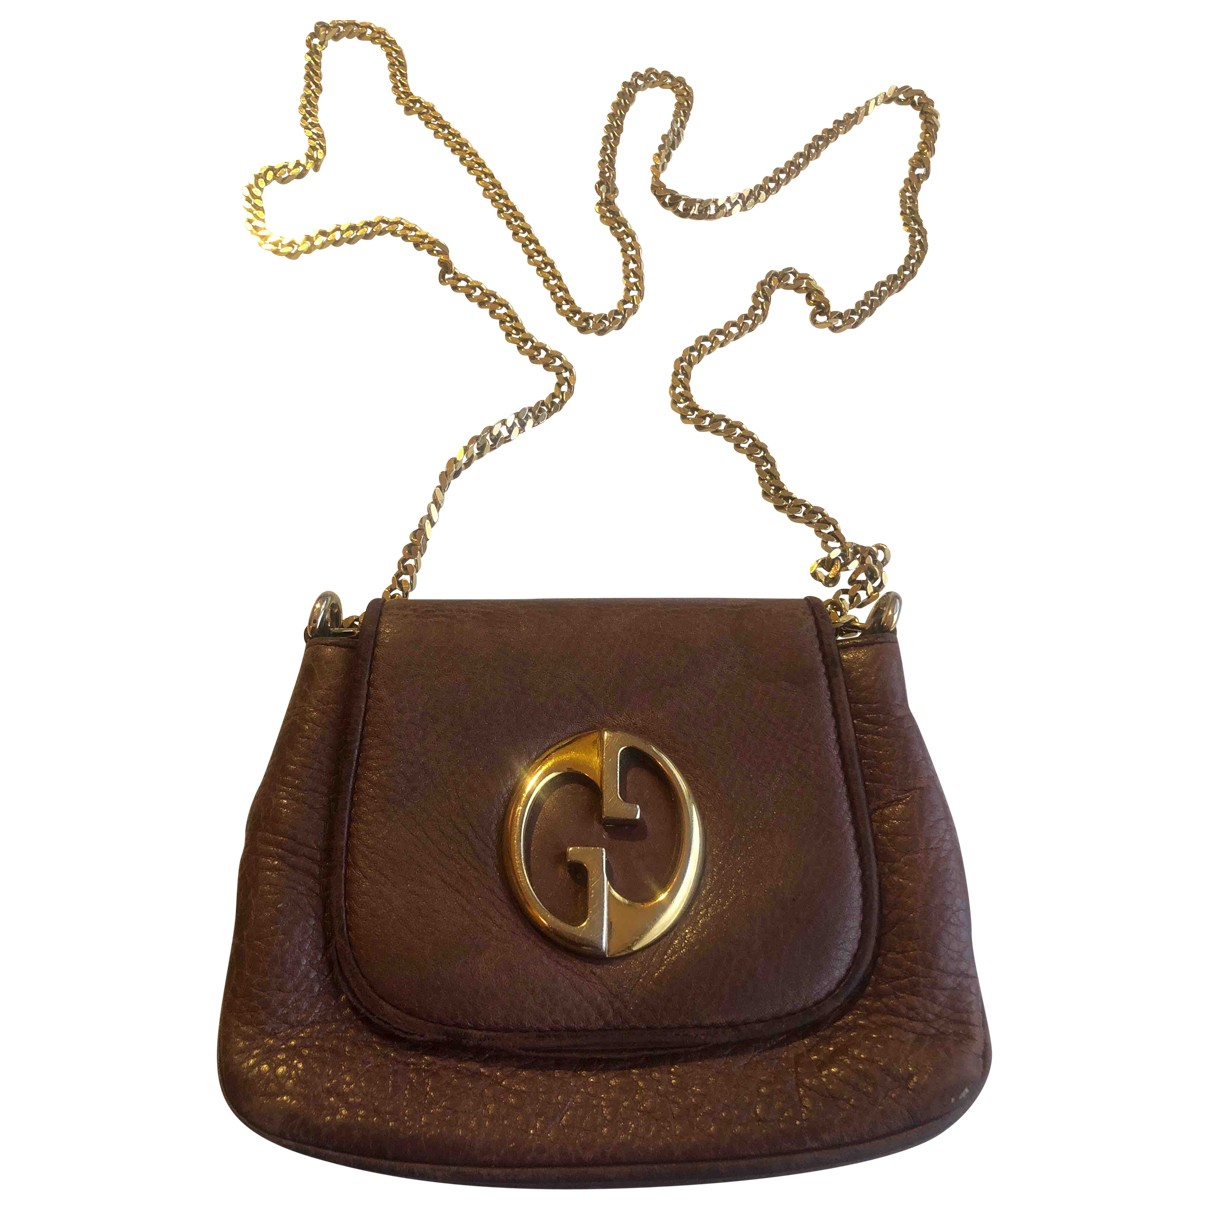 Gucci 1973 Handtasche in  Metallic Leder